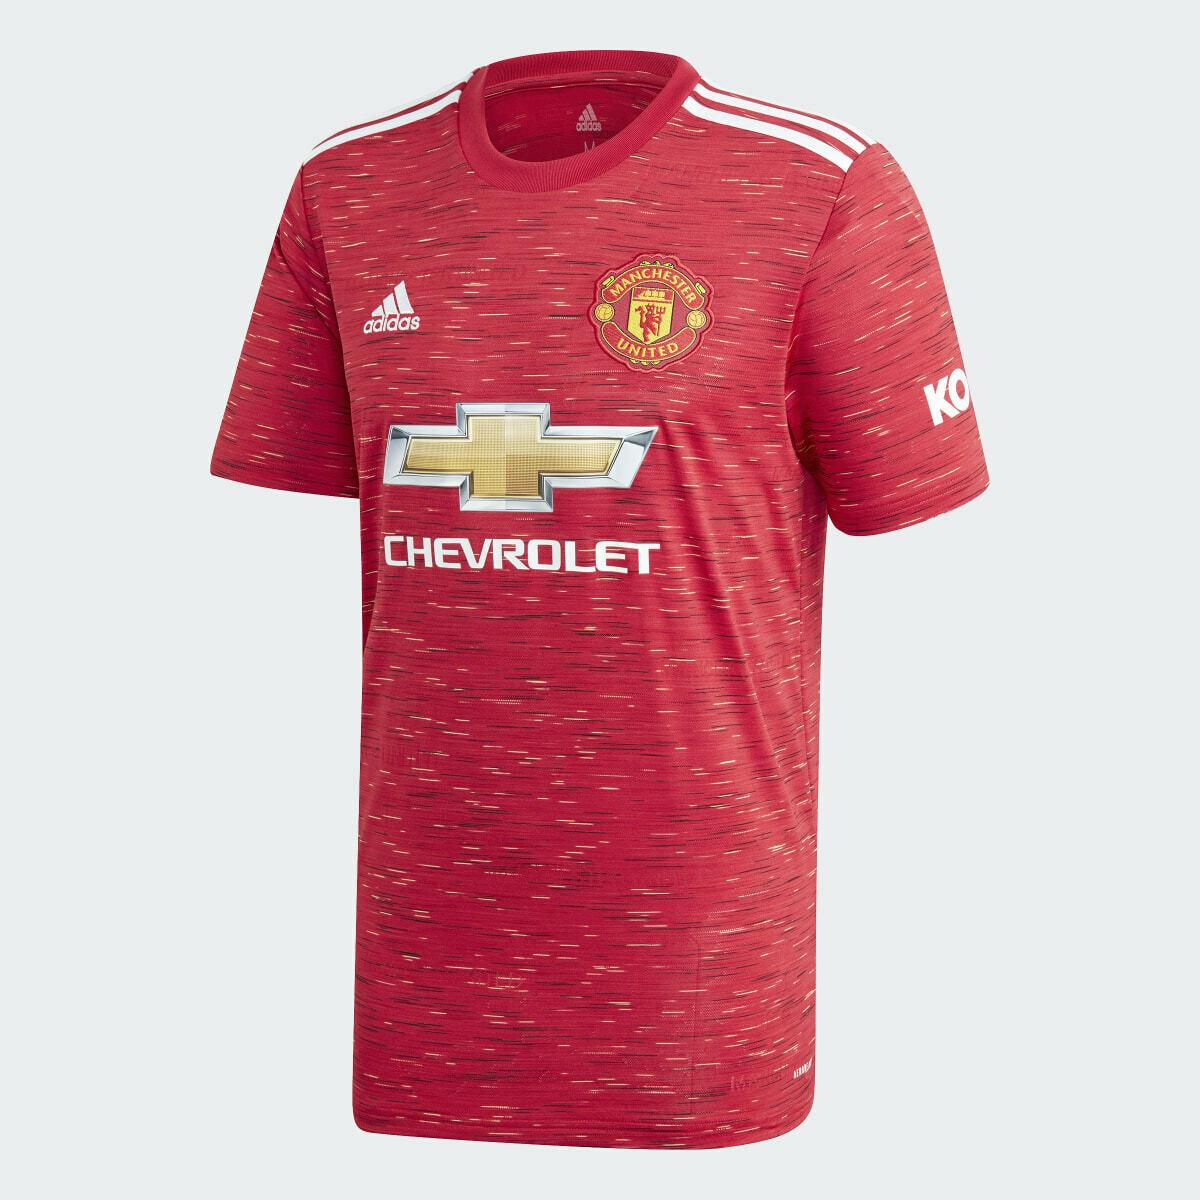 Camisa Manchester United Home  20/21 Masculina Torcedor